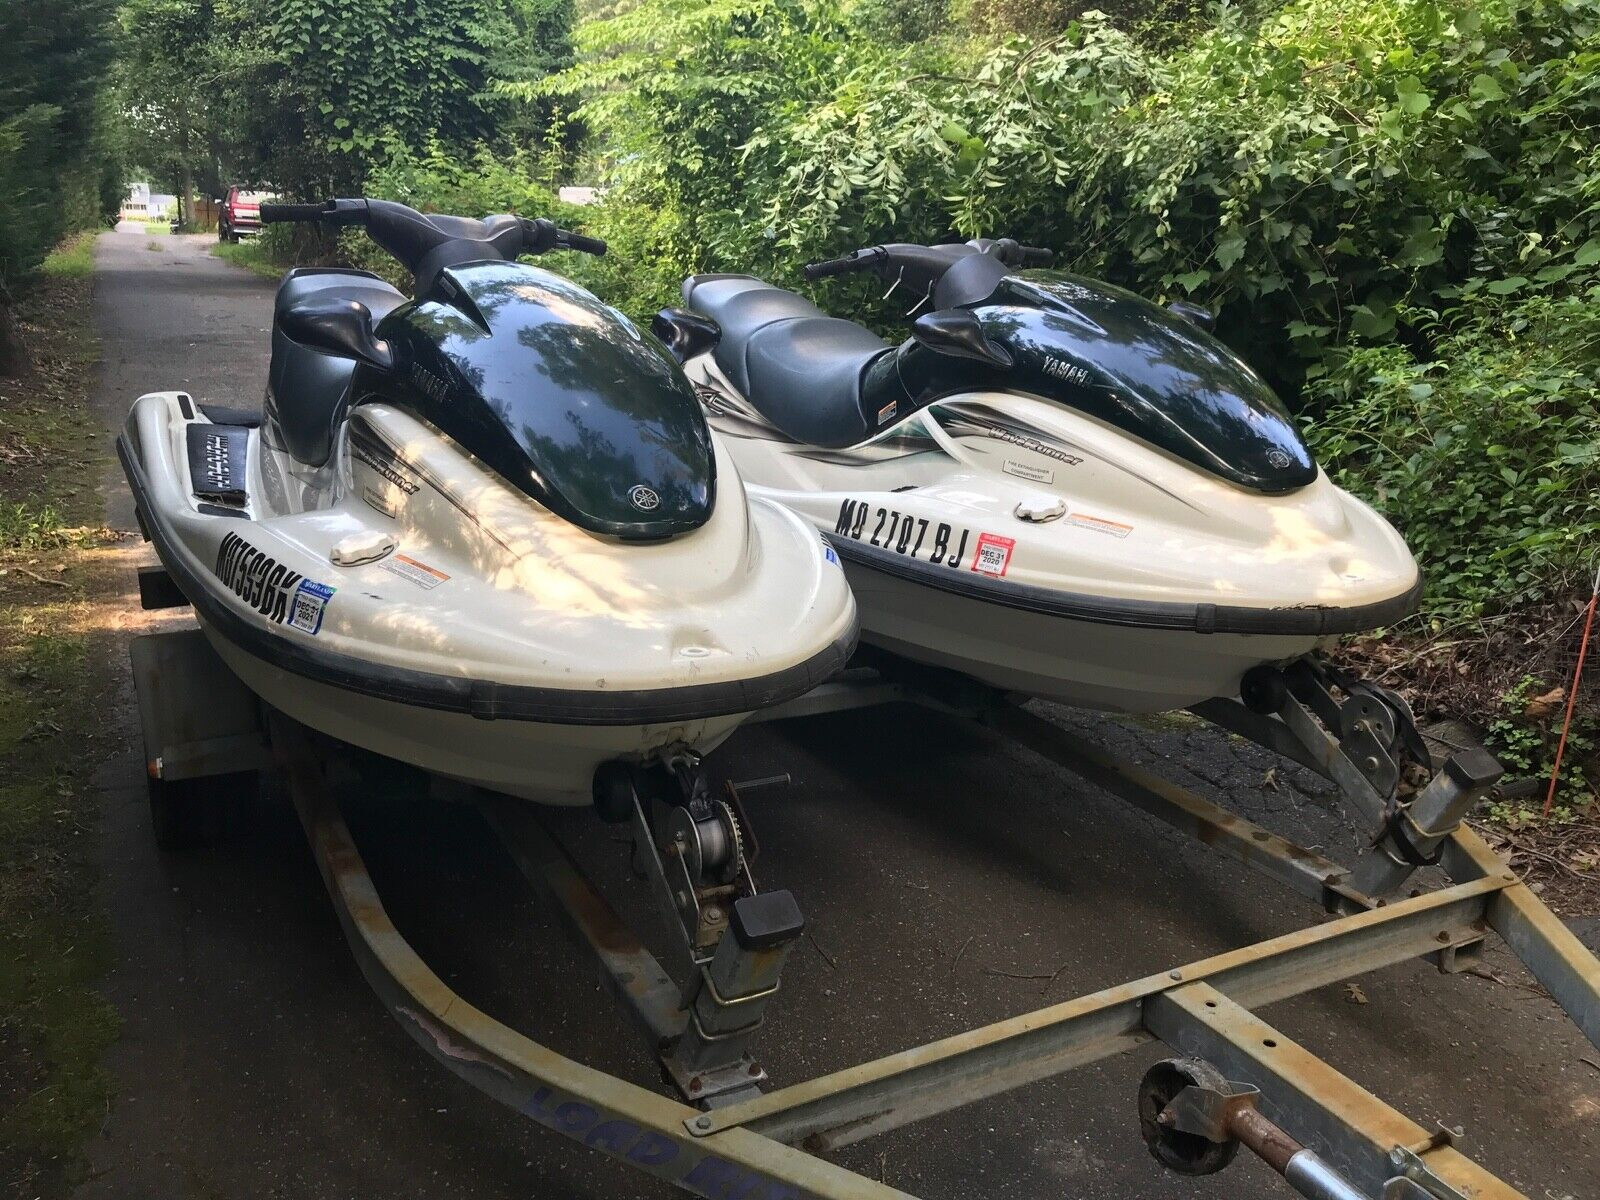 Yamaha XL 12 Jet Ski pair! Good looking skis on double trailer -need motor work.